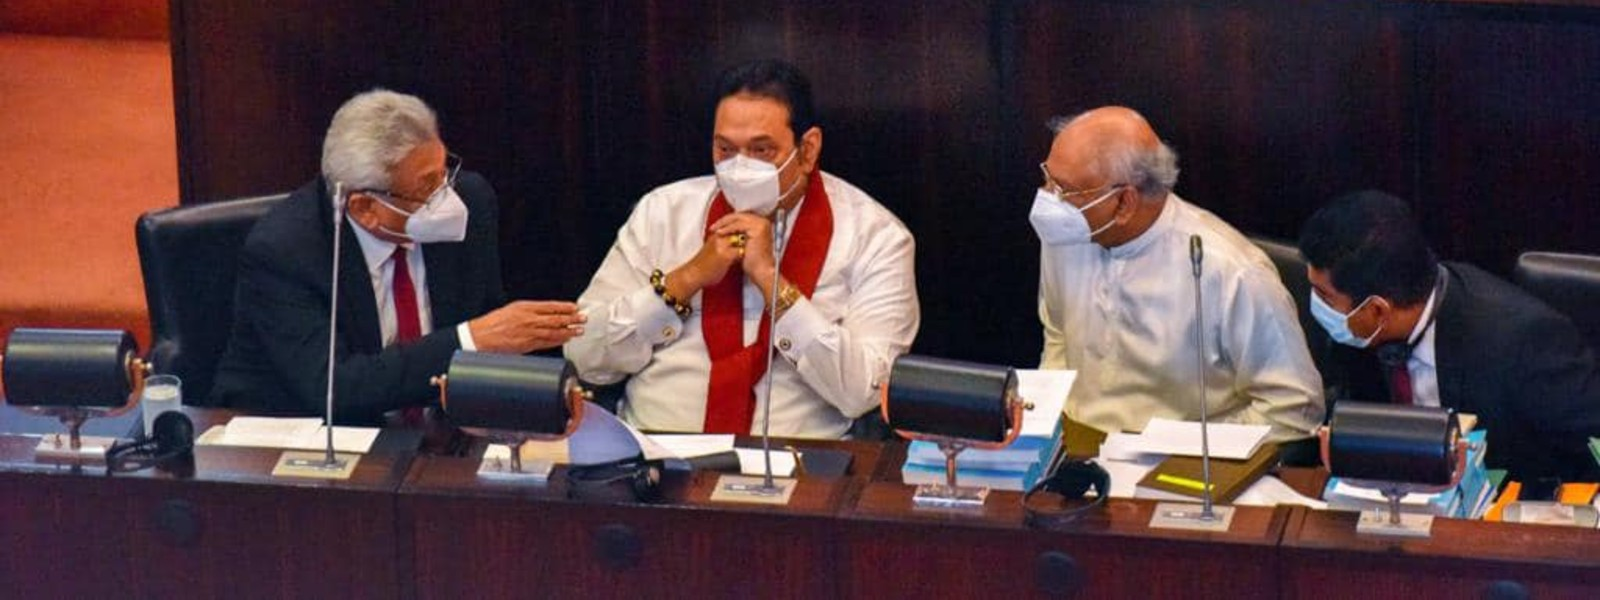 (PICTURES) President Gotabaya Rajapaksa visits Parliament